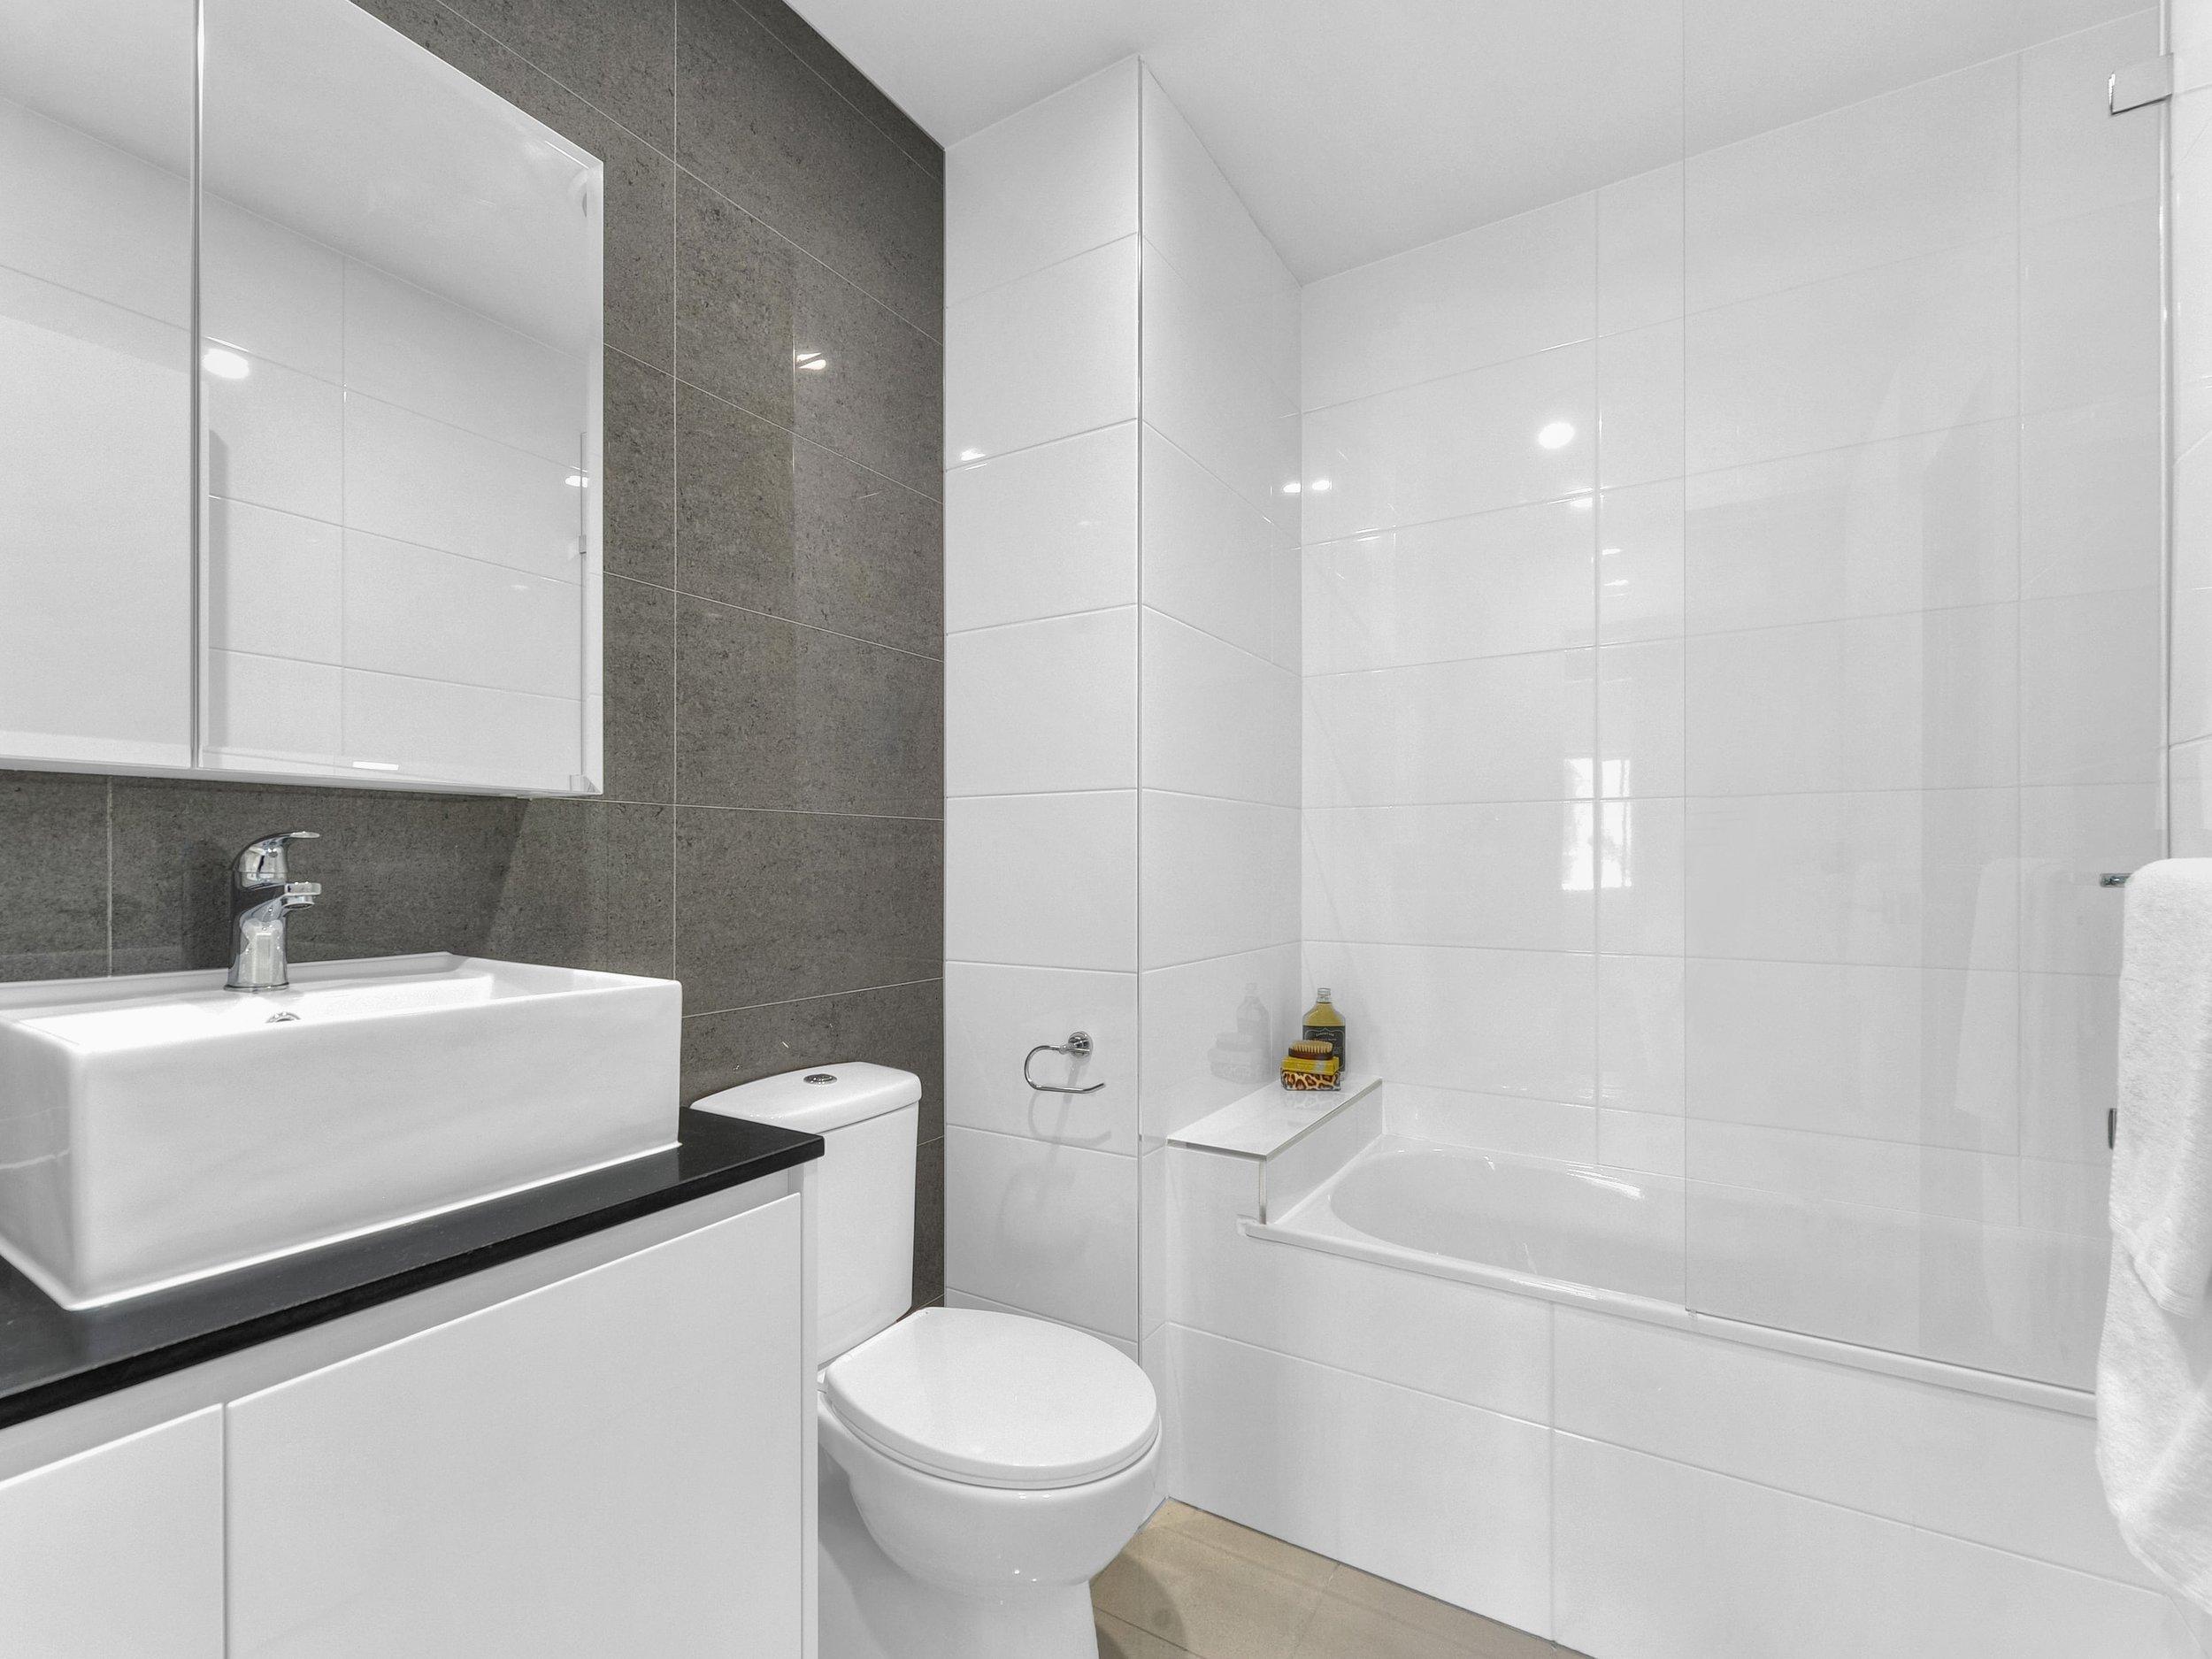 Bathroom-min.jpg